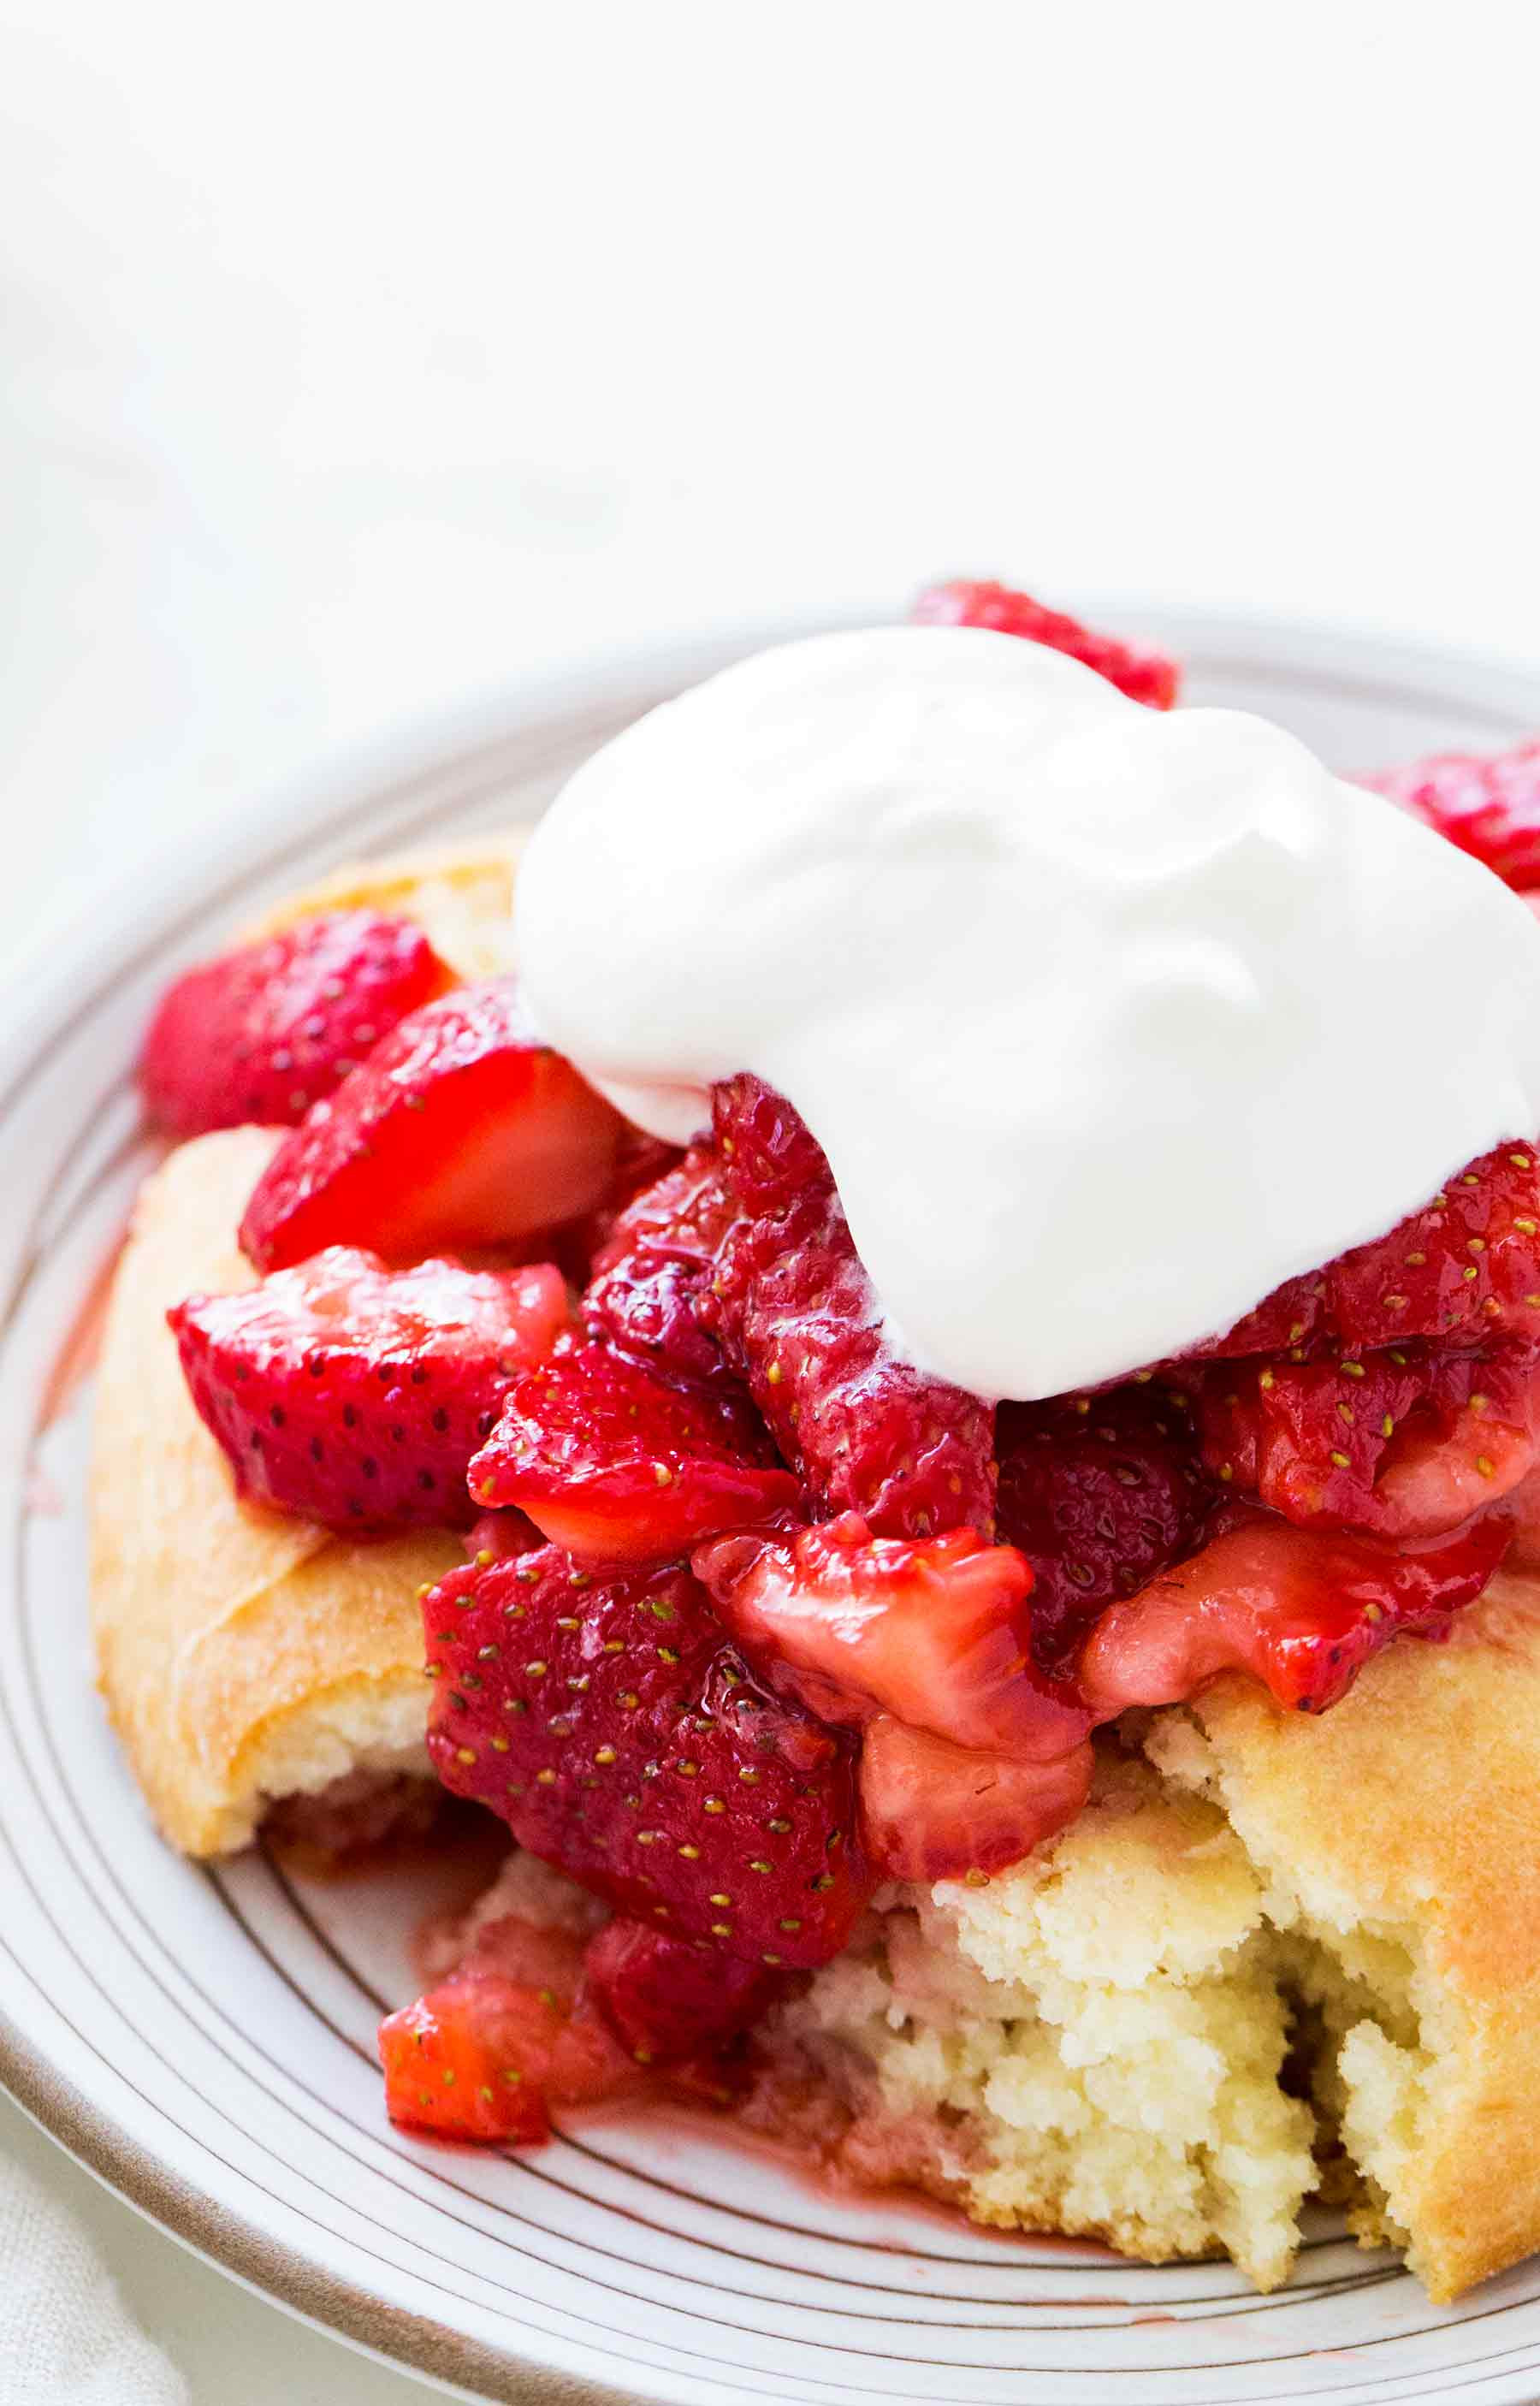 Strawberry Shortcake Videos  Strawberry Shortcake Recipe